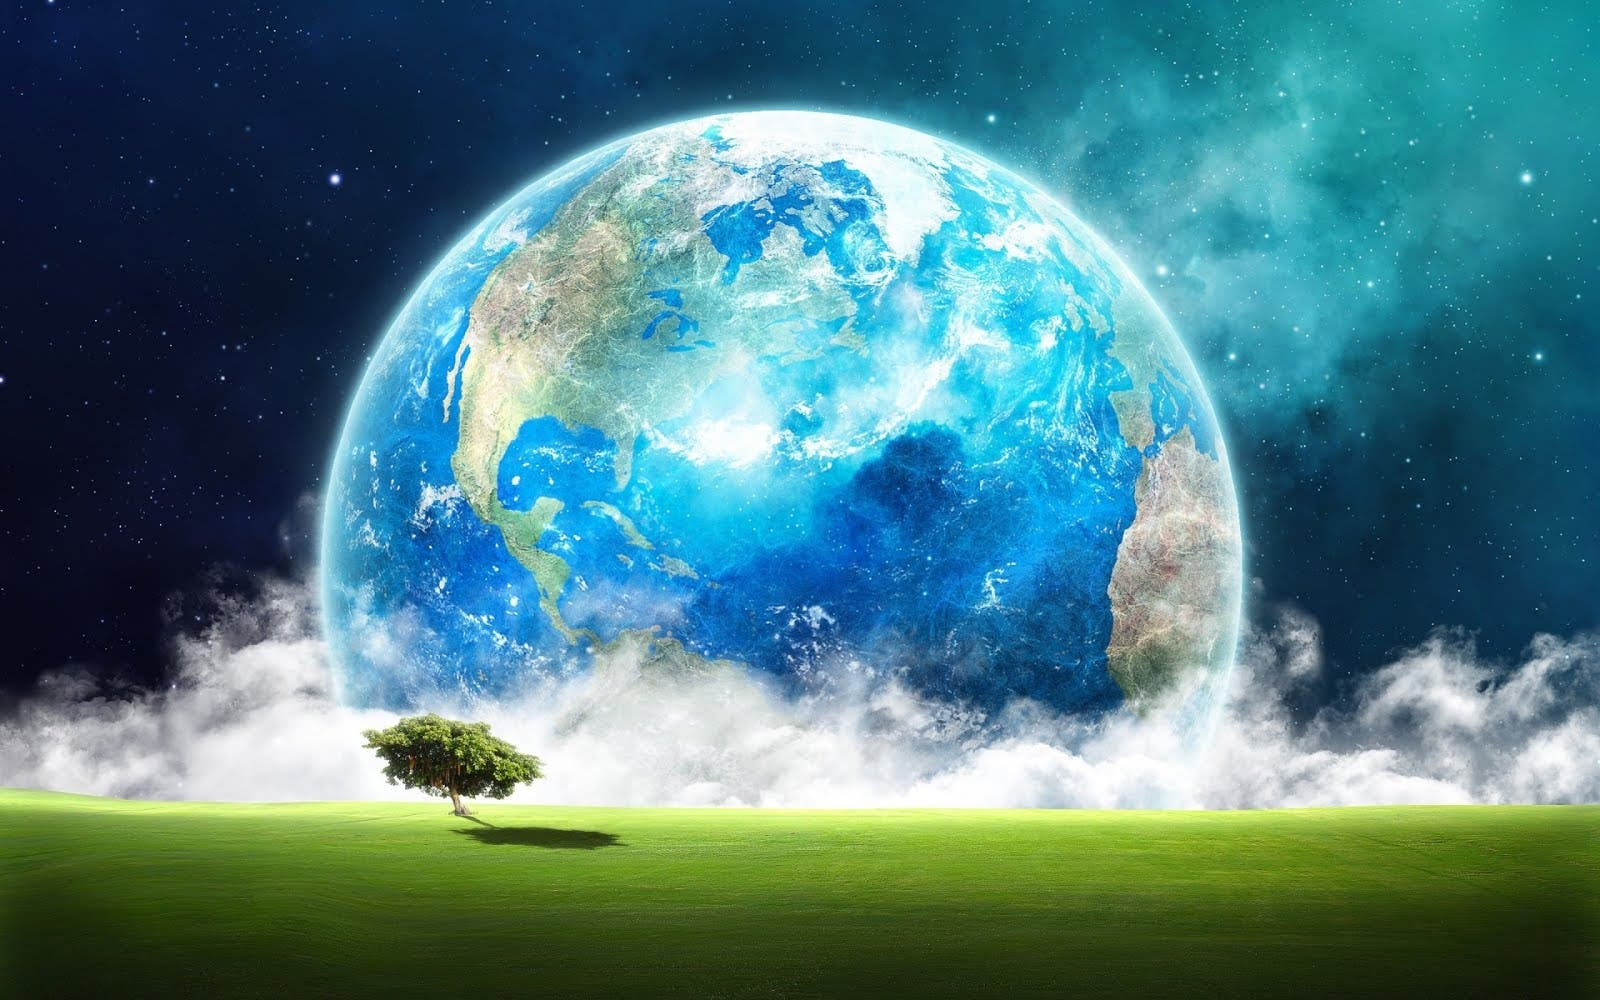 Mira esta posible solución al 'acertijo de Gaia'